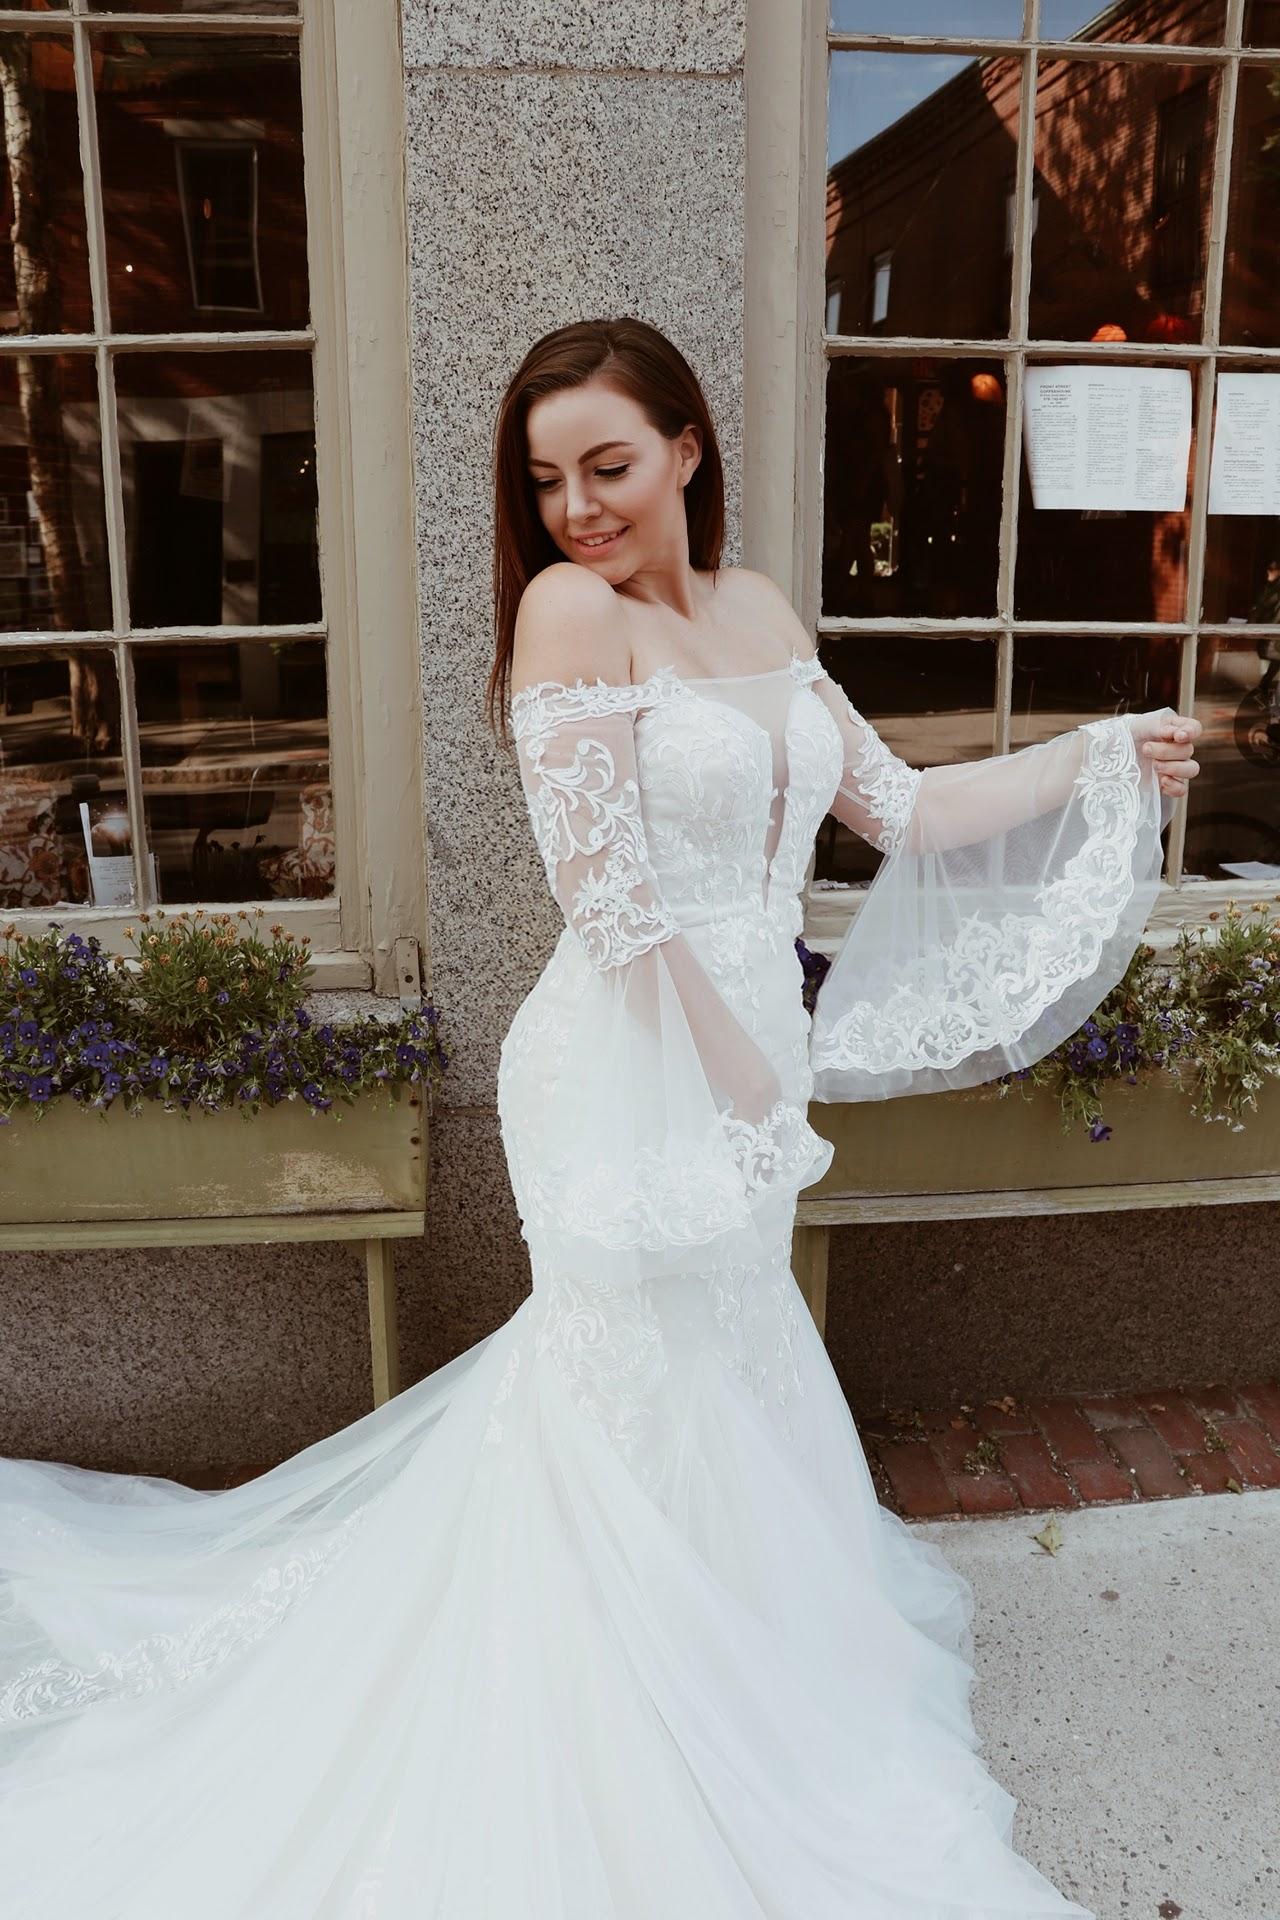 Playful wedding dress